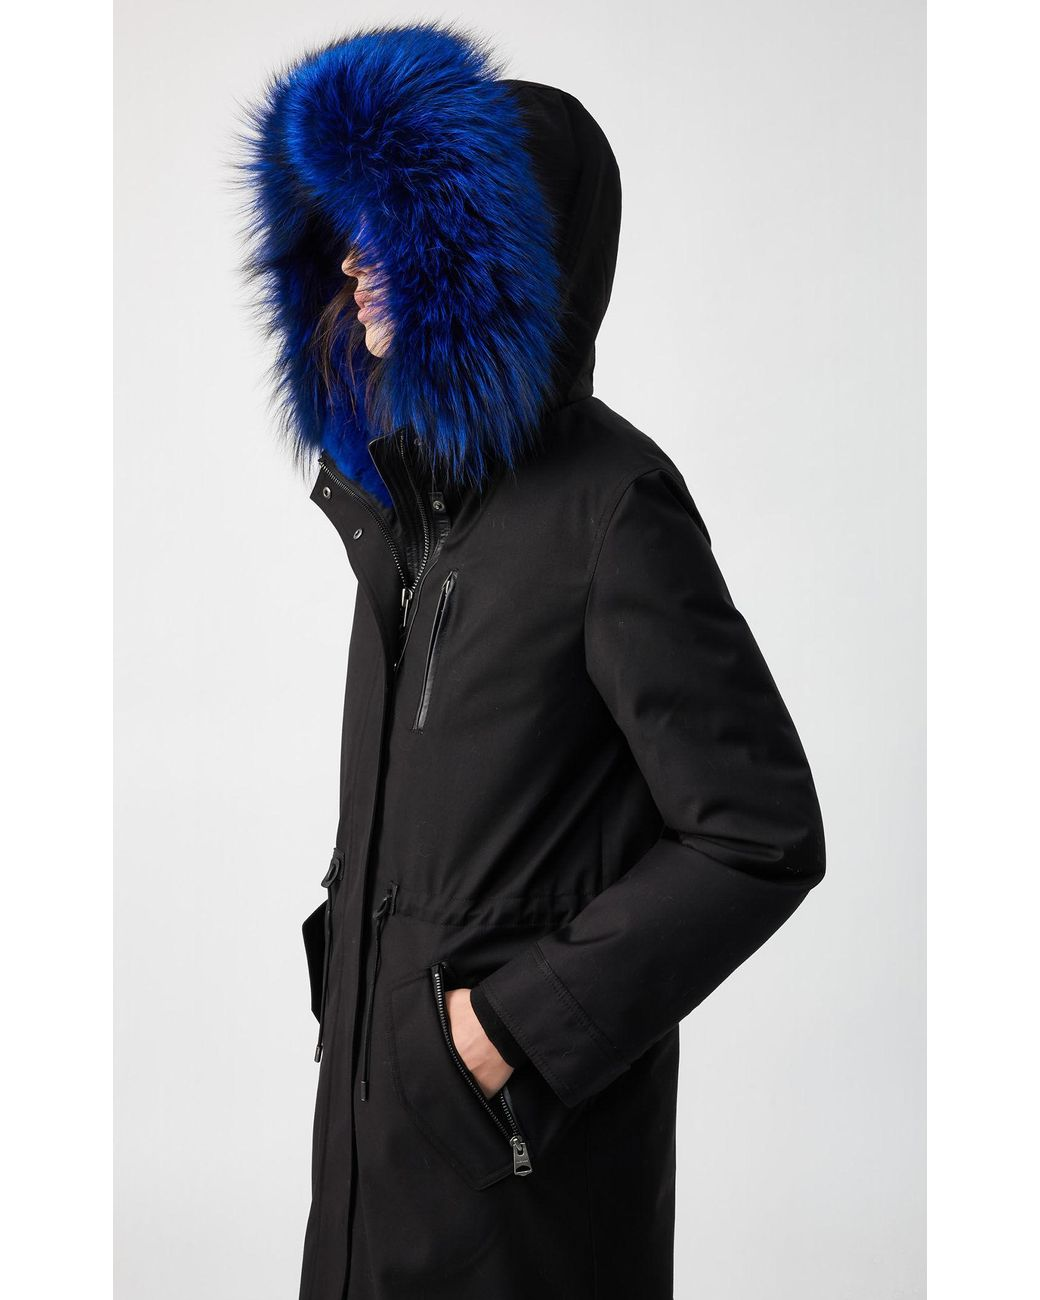 Missoni Home bathrobe with VIRGINIO hood pullover effect